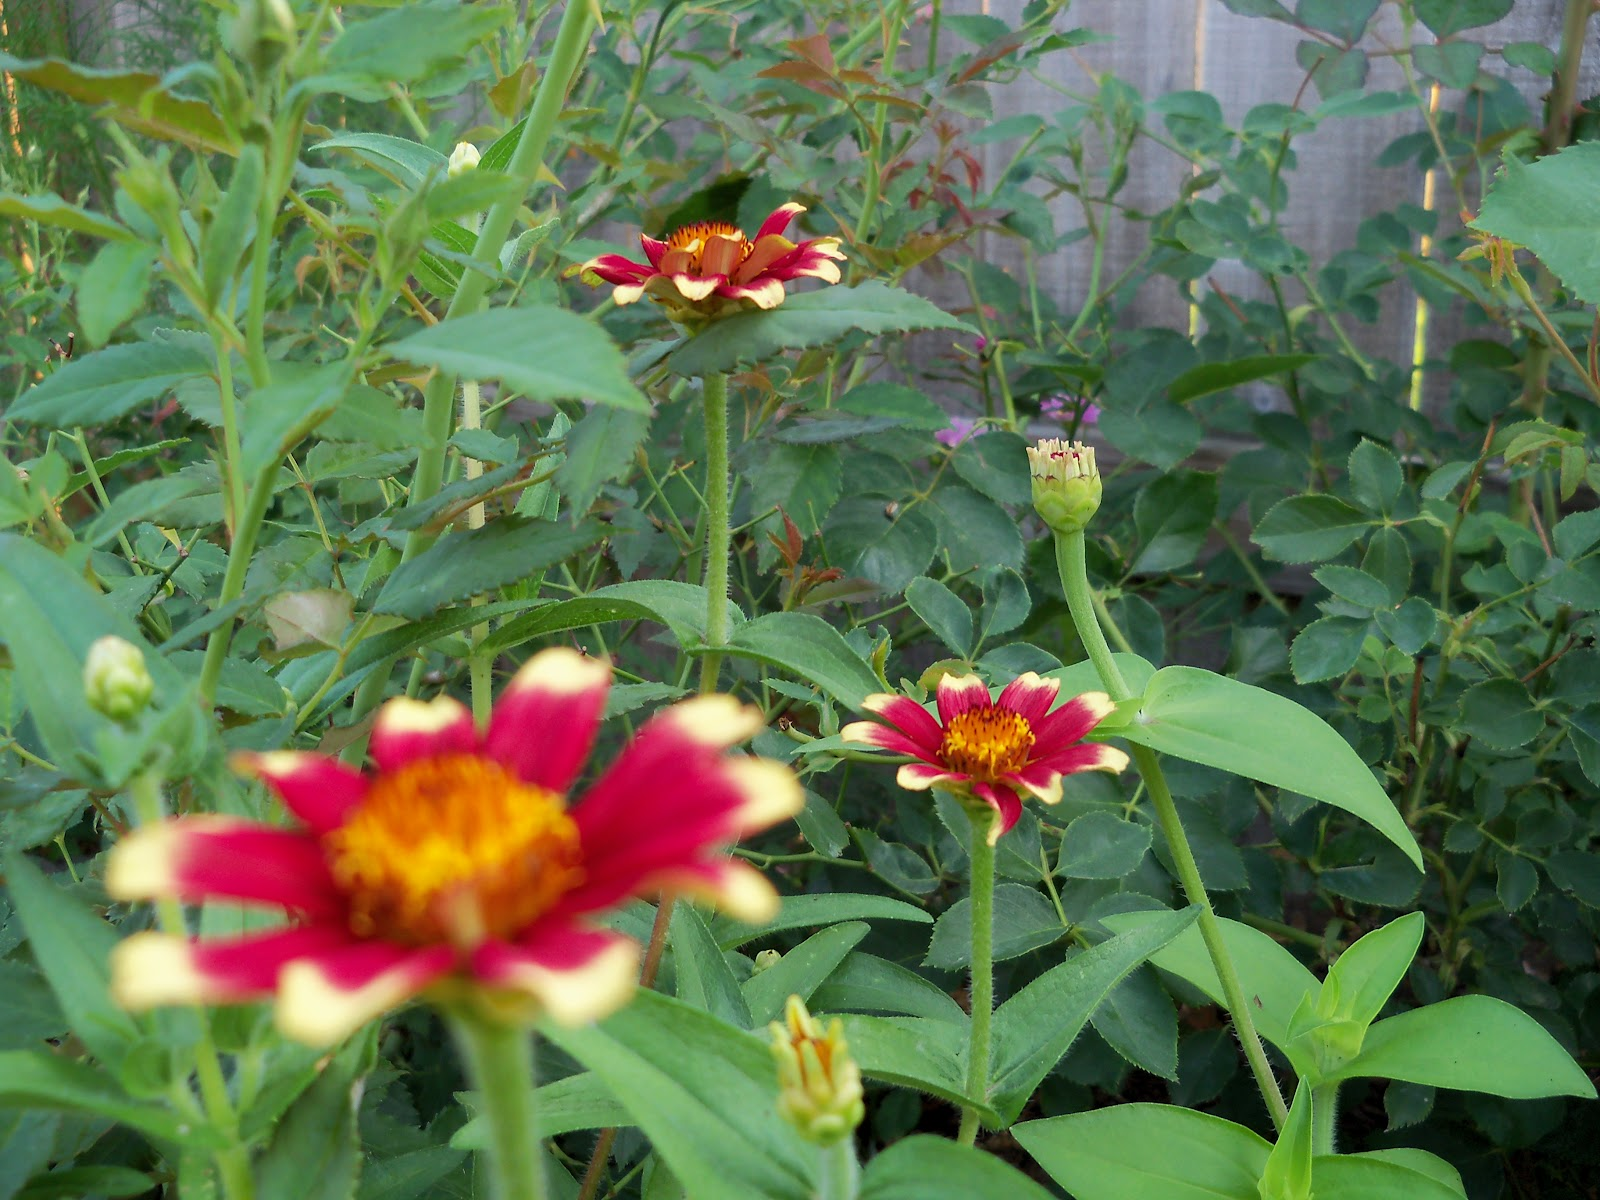 Gardening 2010, Part Two - 101_2998.JPG